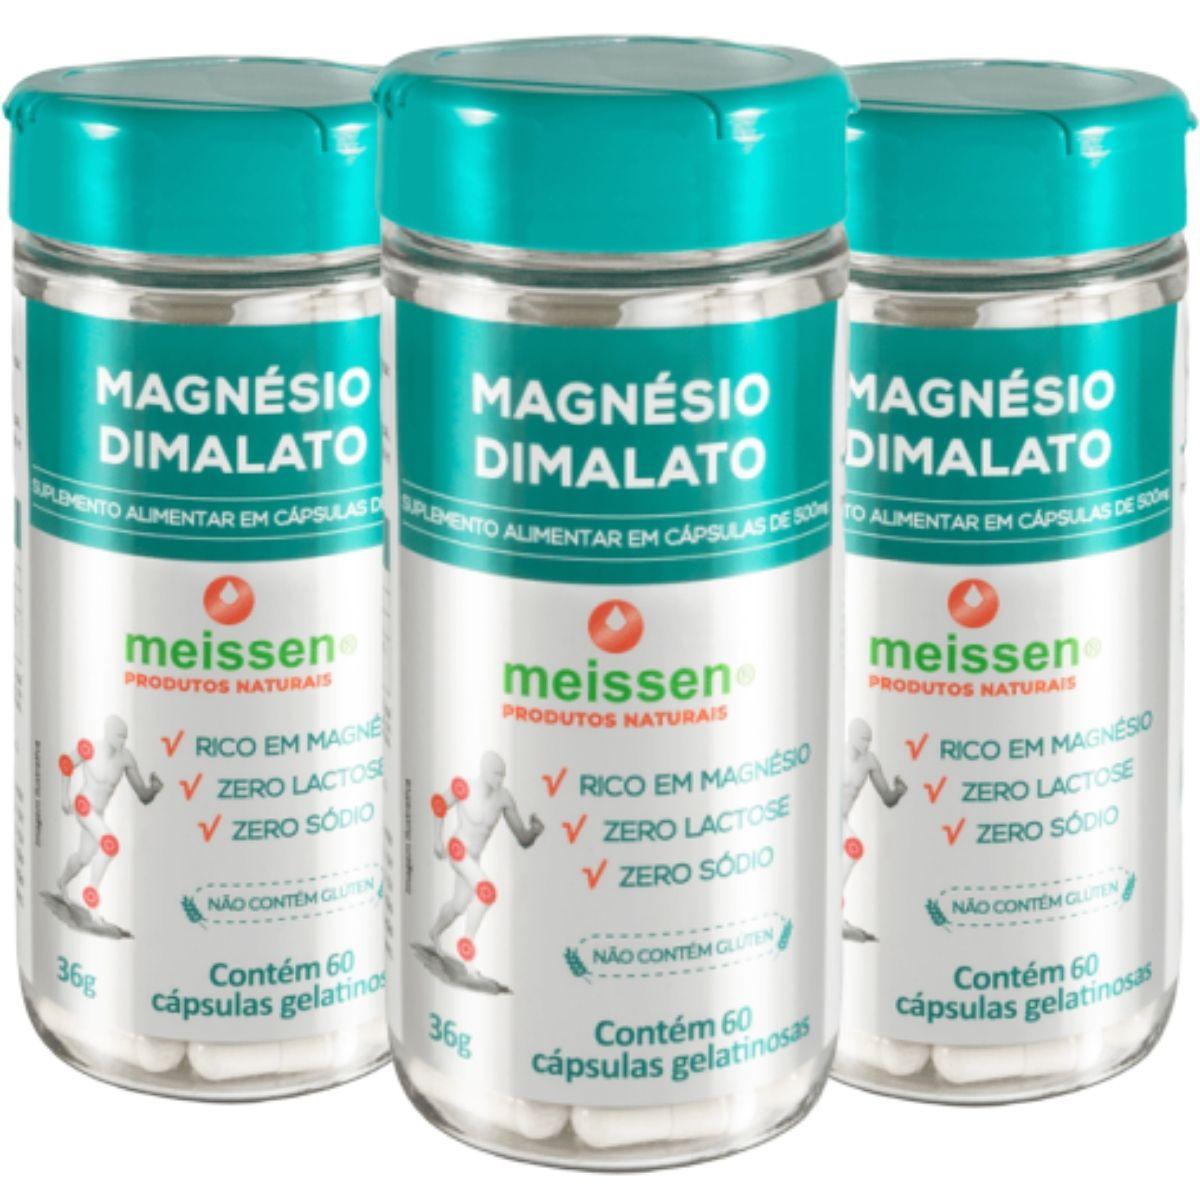 3 Magnesio Dimalato  Puro - 180 Capsulas - 2 x Dia - Meissen